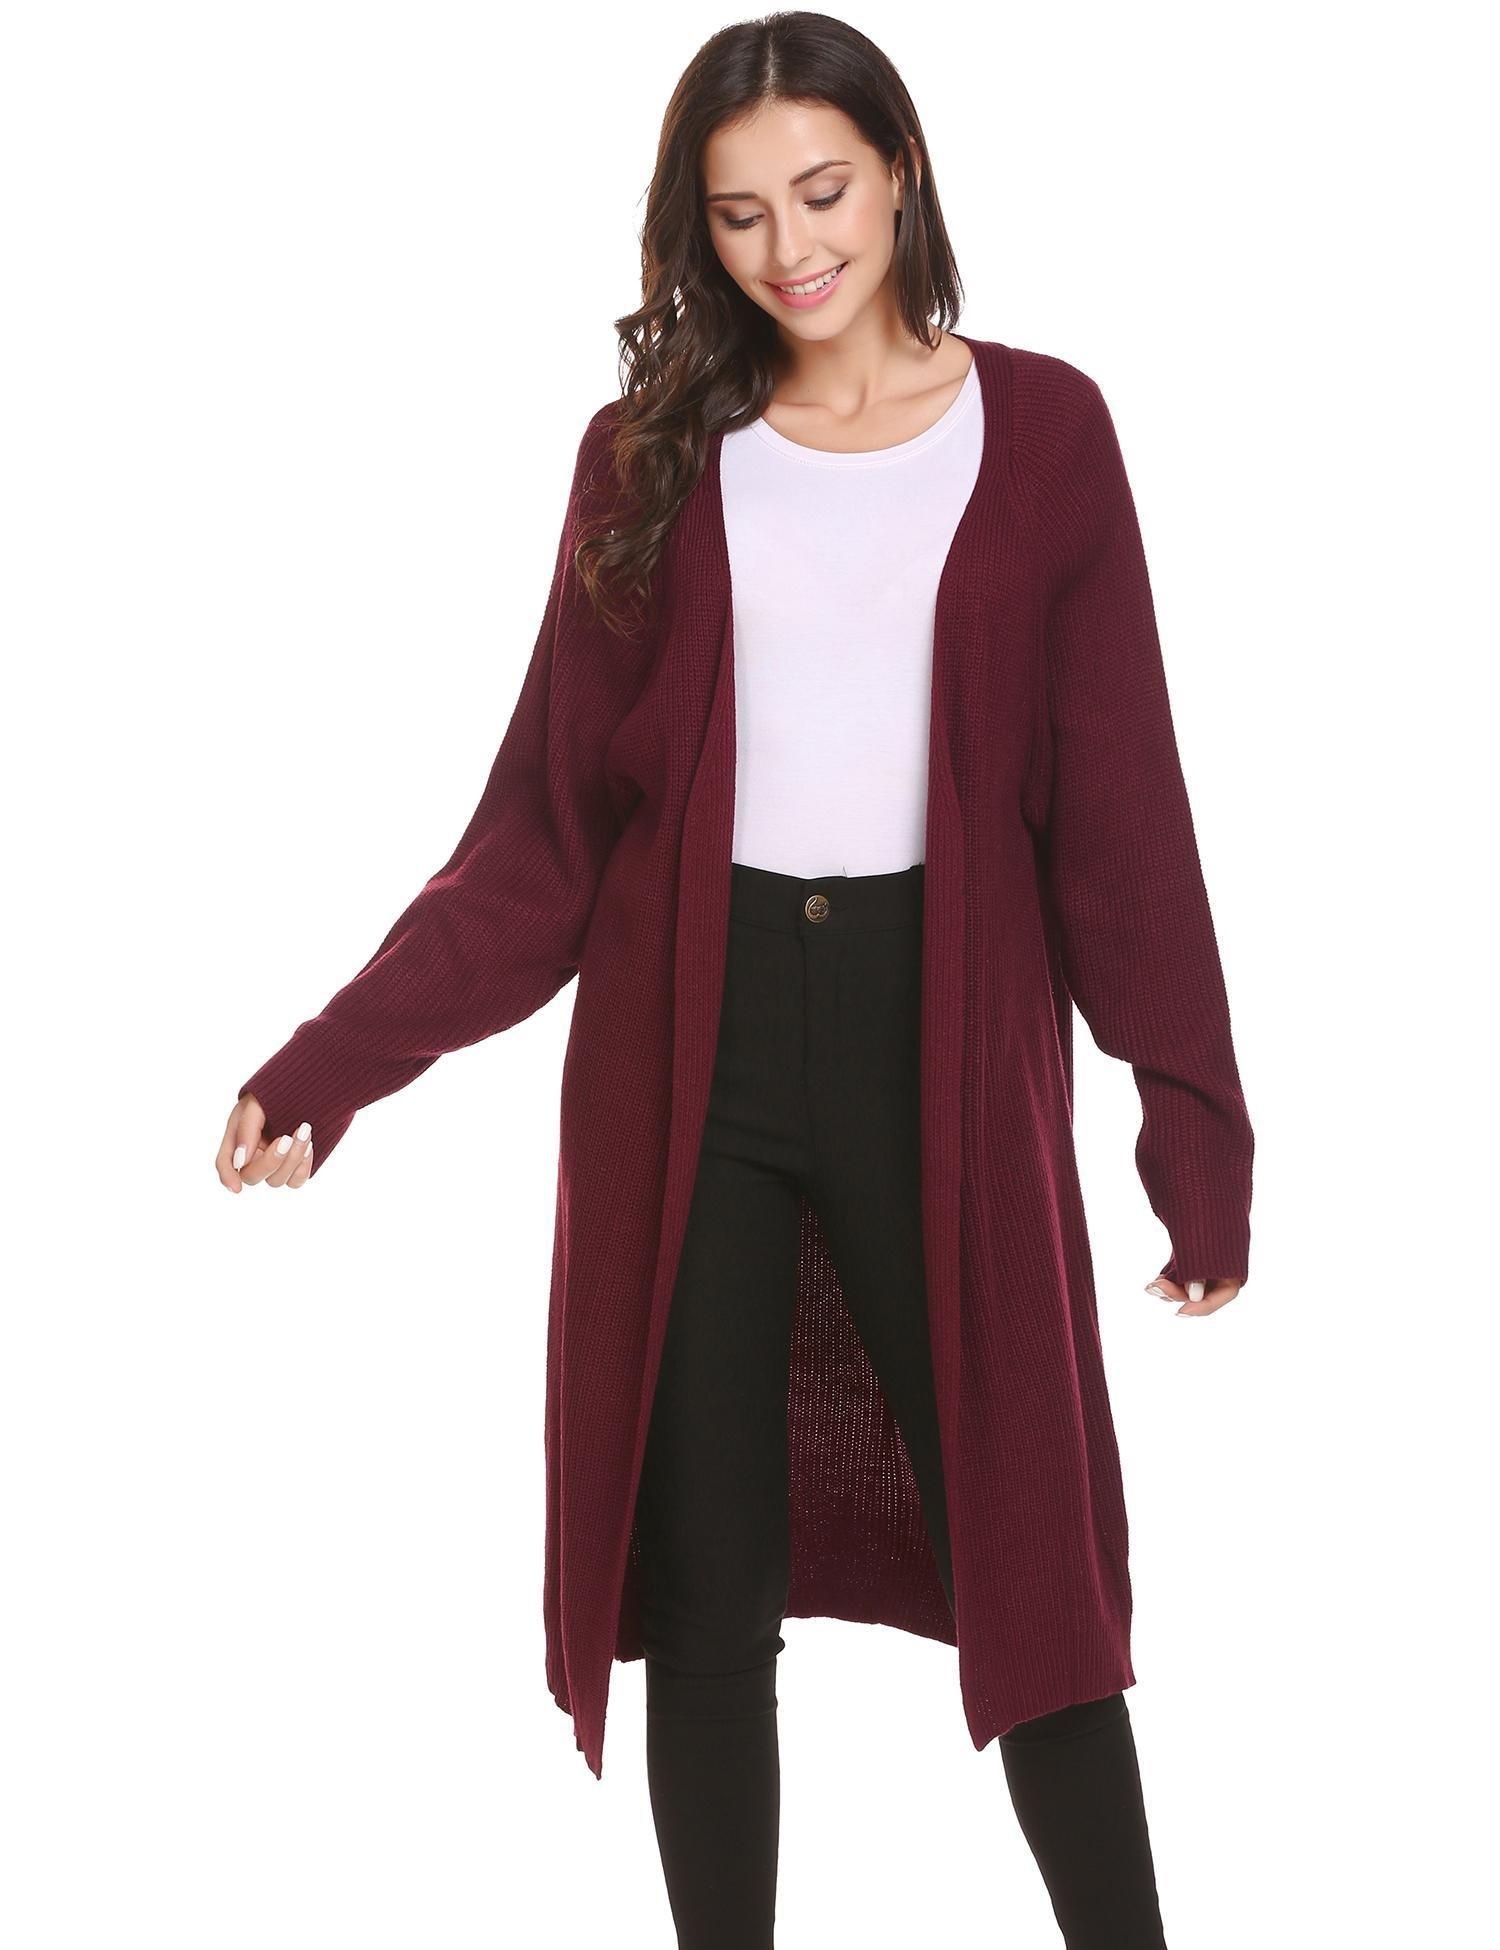 Womens Solid Basic White Long Sleeve Bolero Shrug Knit Crop Cardigan Top Wine Red M